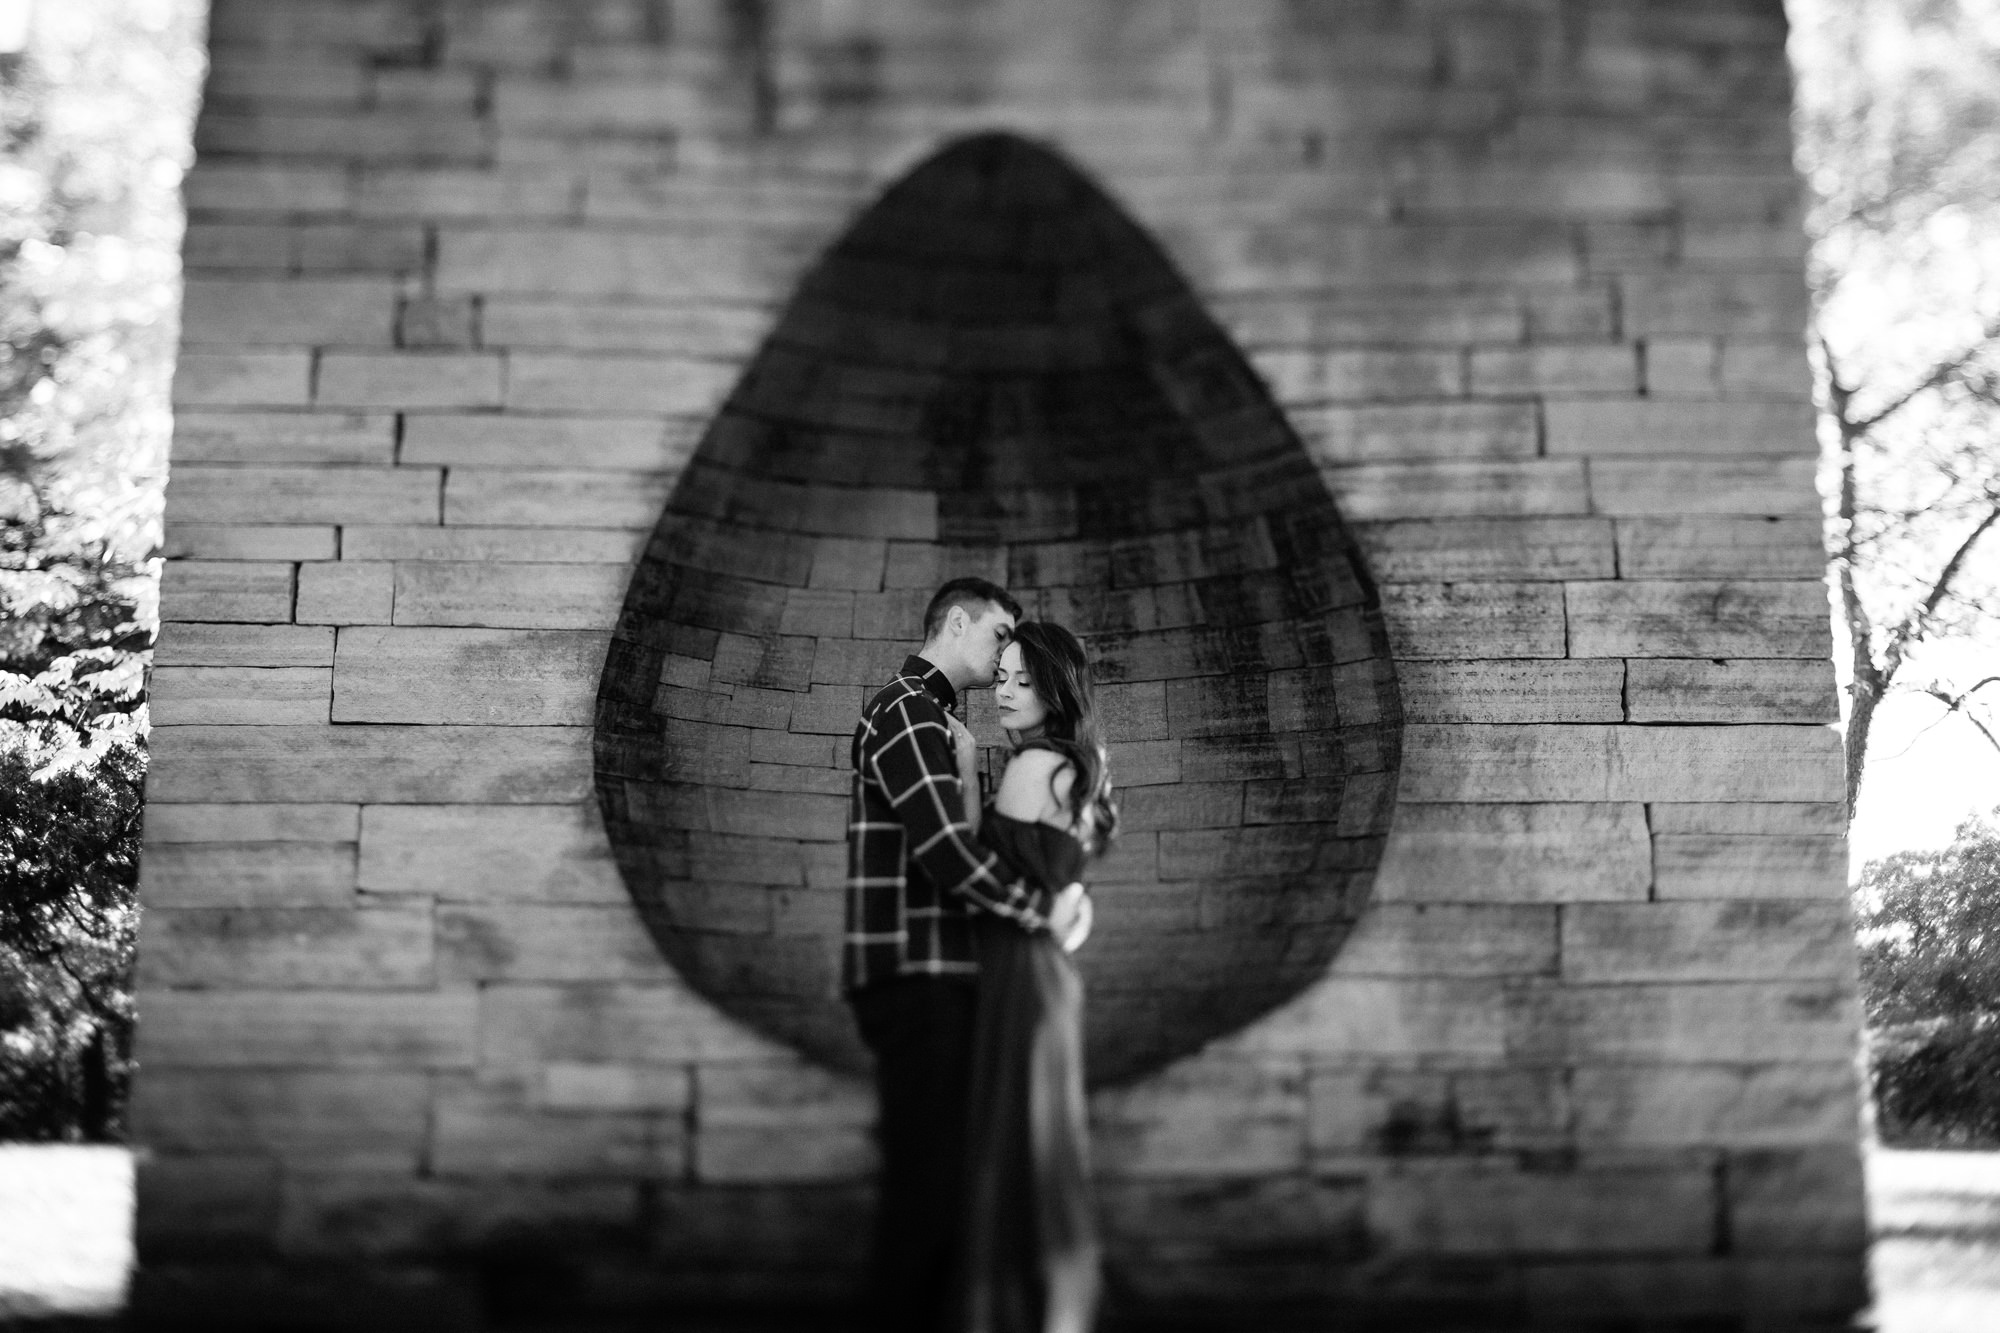 wedding-elopement-adventerous-romantic-timeless-des-moines-siouxfalls-photography-10.jpg